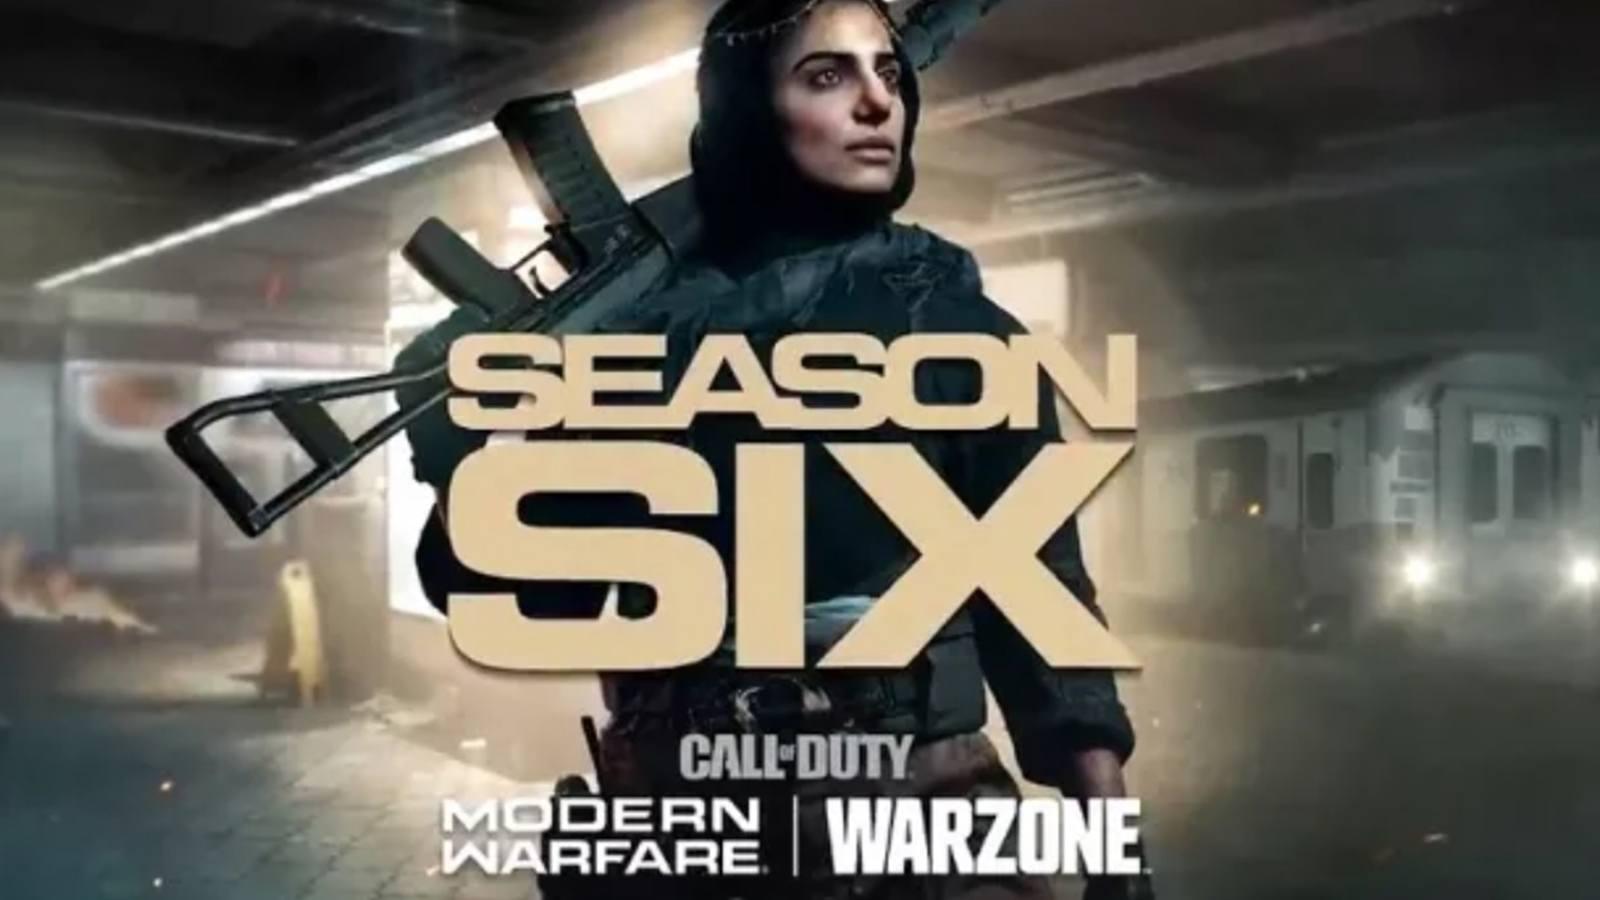 Saison 6 de Modern Warfare et Warzone